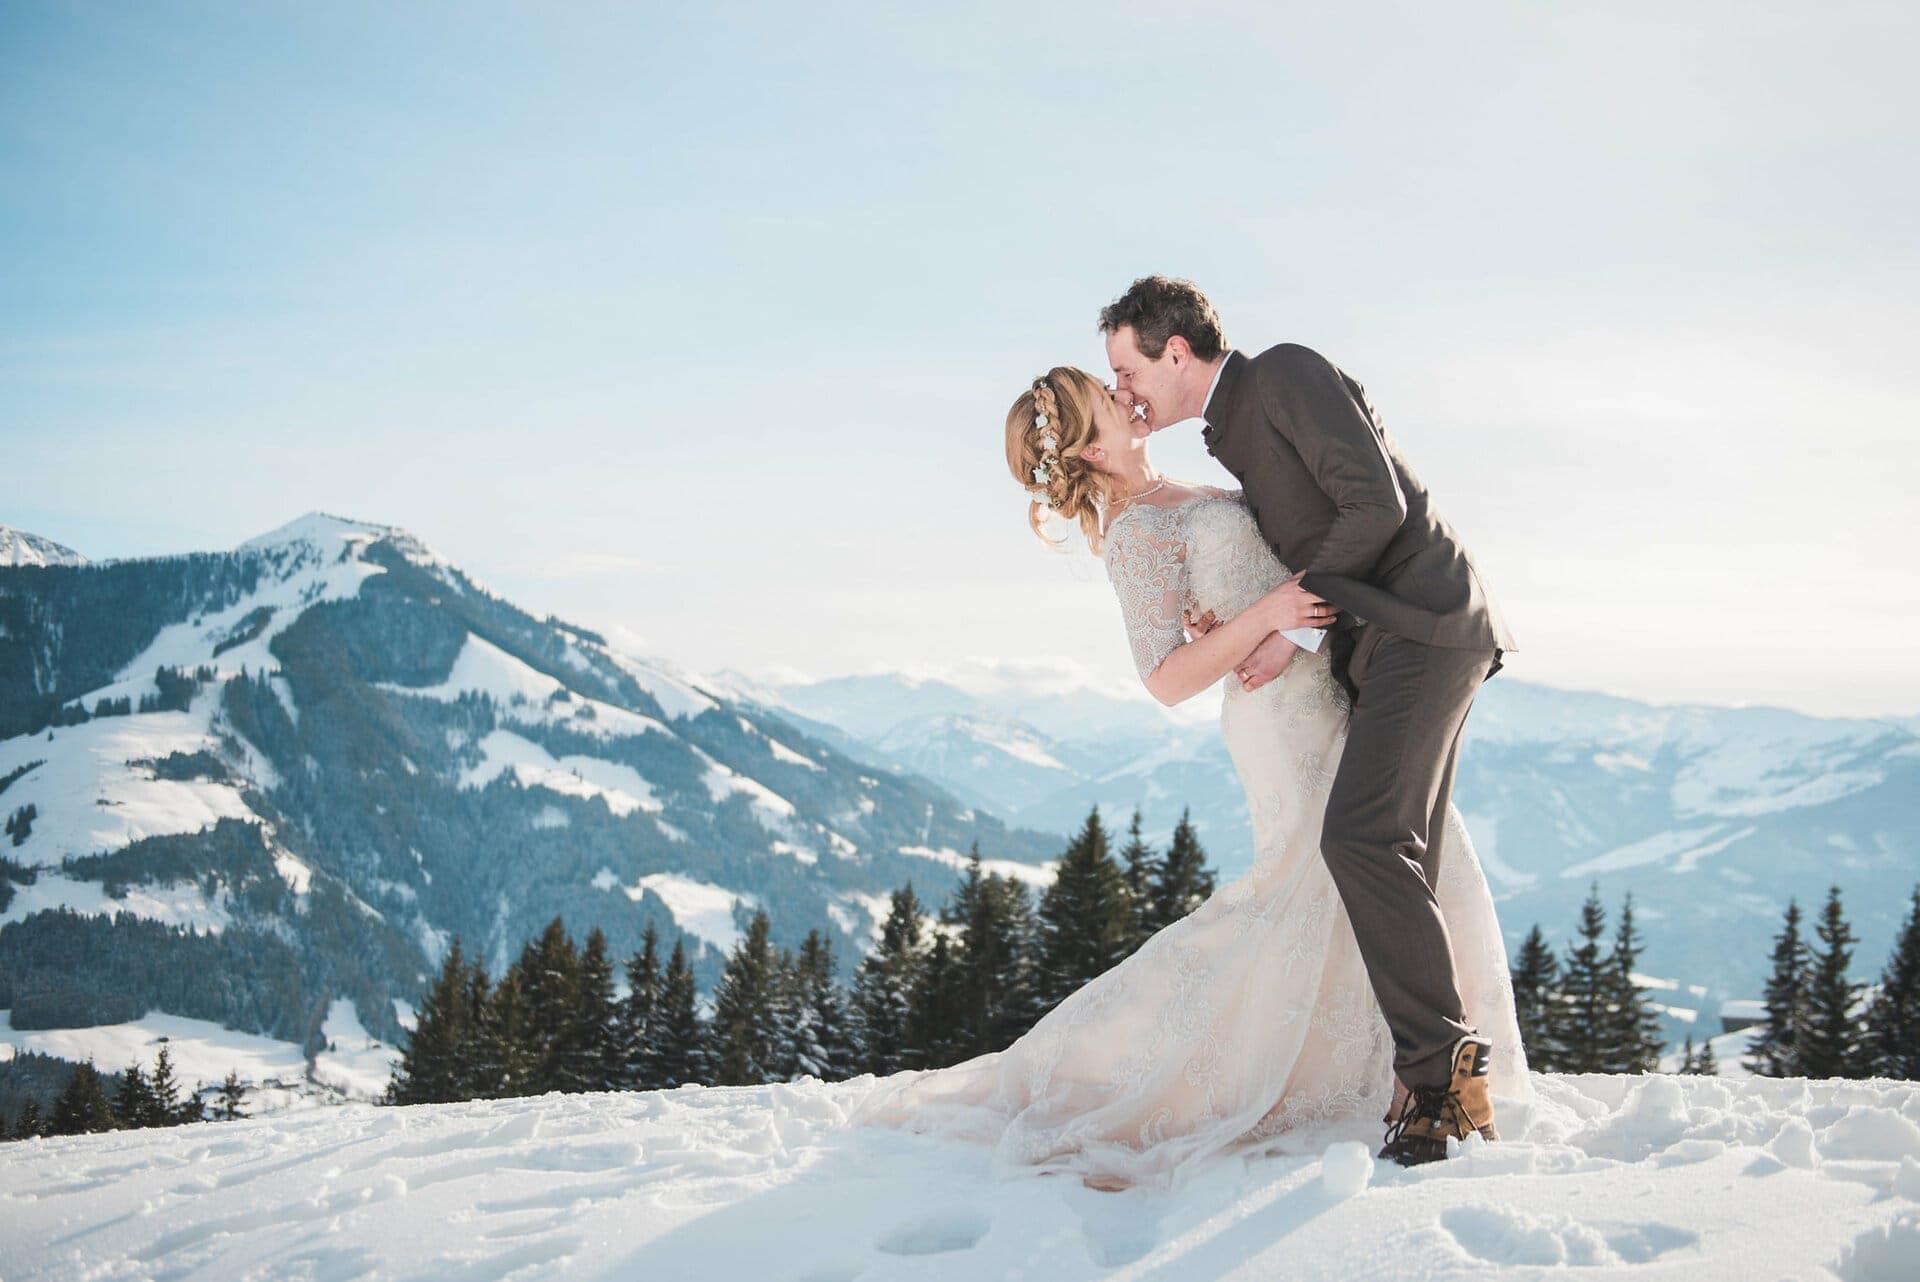 winterse bruiloft - Girls of honour